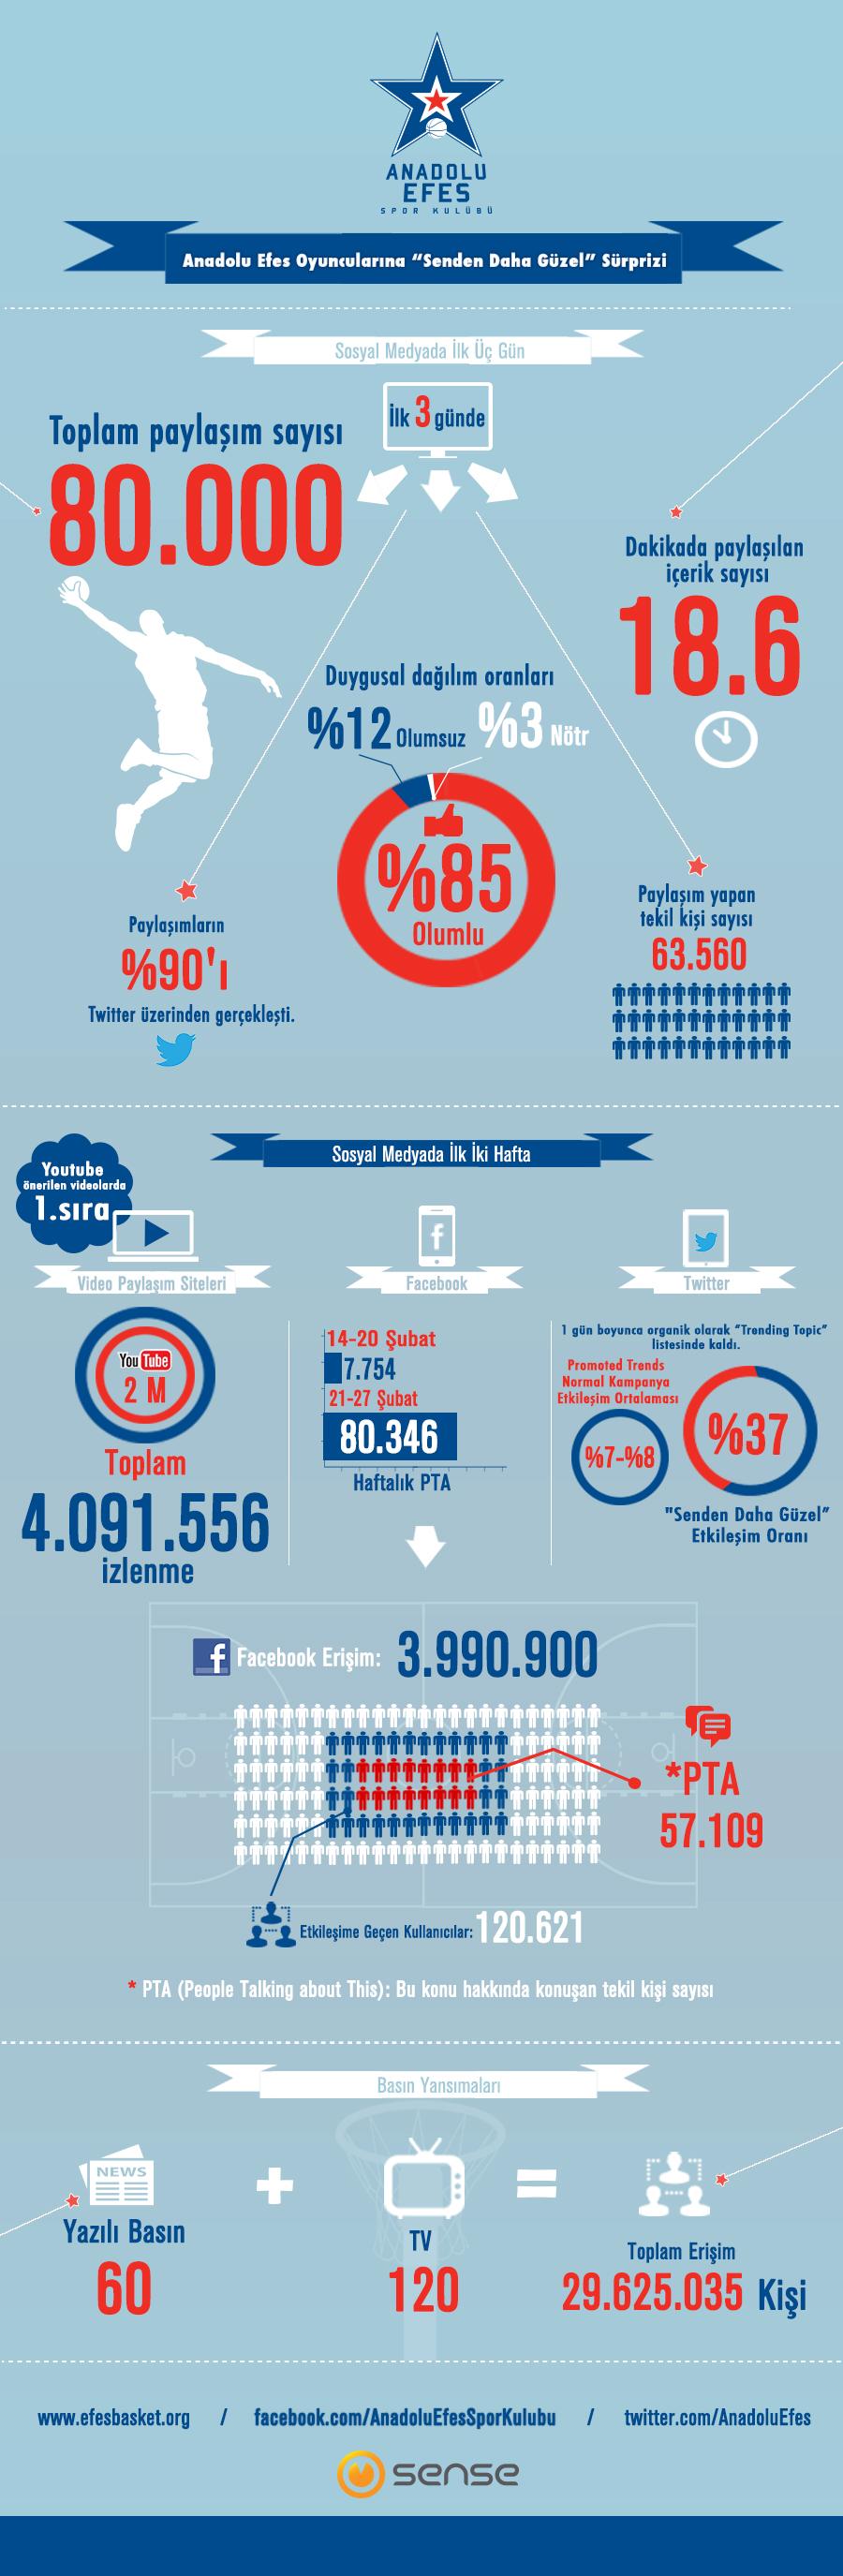 Senden Daha Güzel surprizinin sosyal medya analizi #anadoluefes #efespilsen #infographic